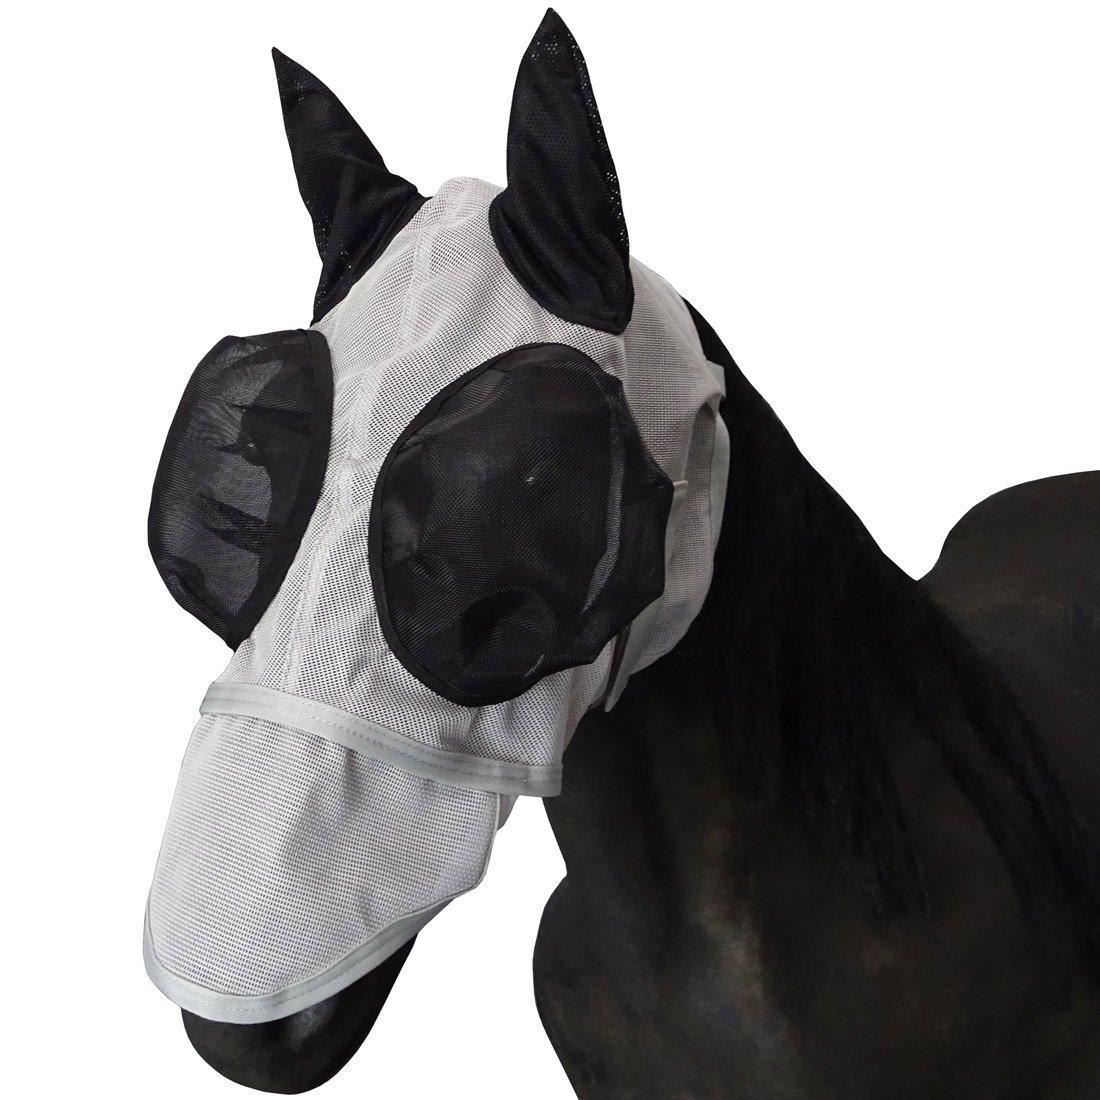 Leberna Mesh Fly Mask with Ears Nose UV Protection Full Face for Horse/Cob by Leberna